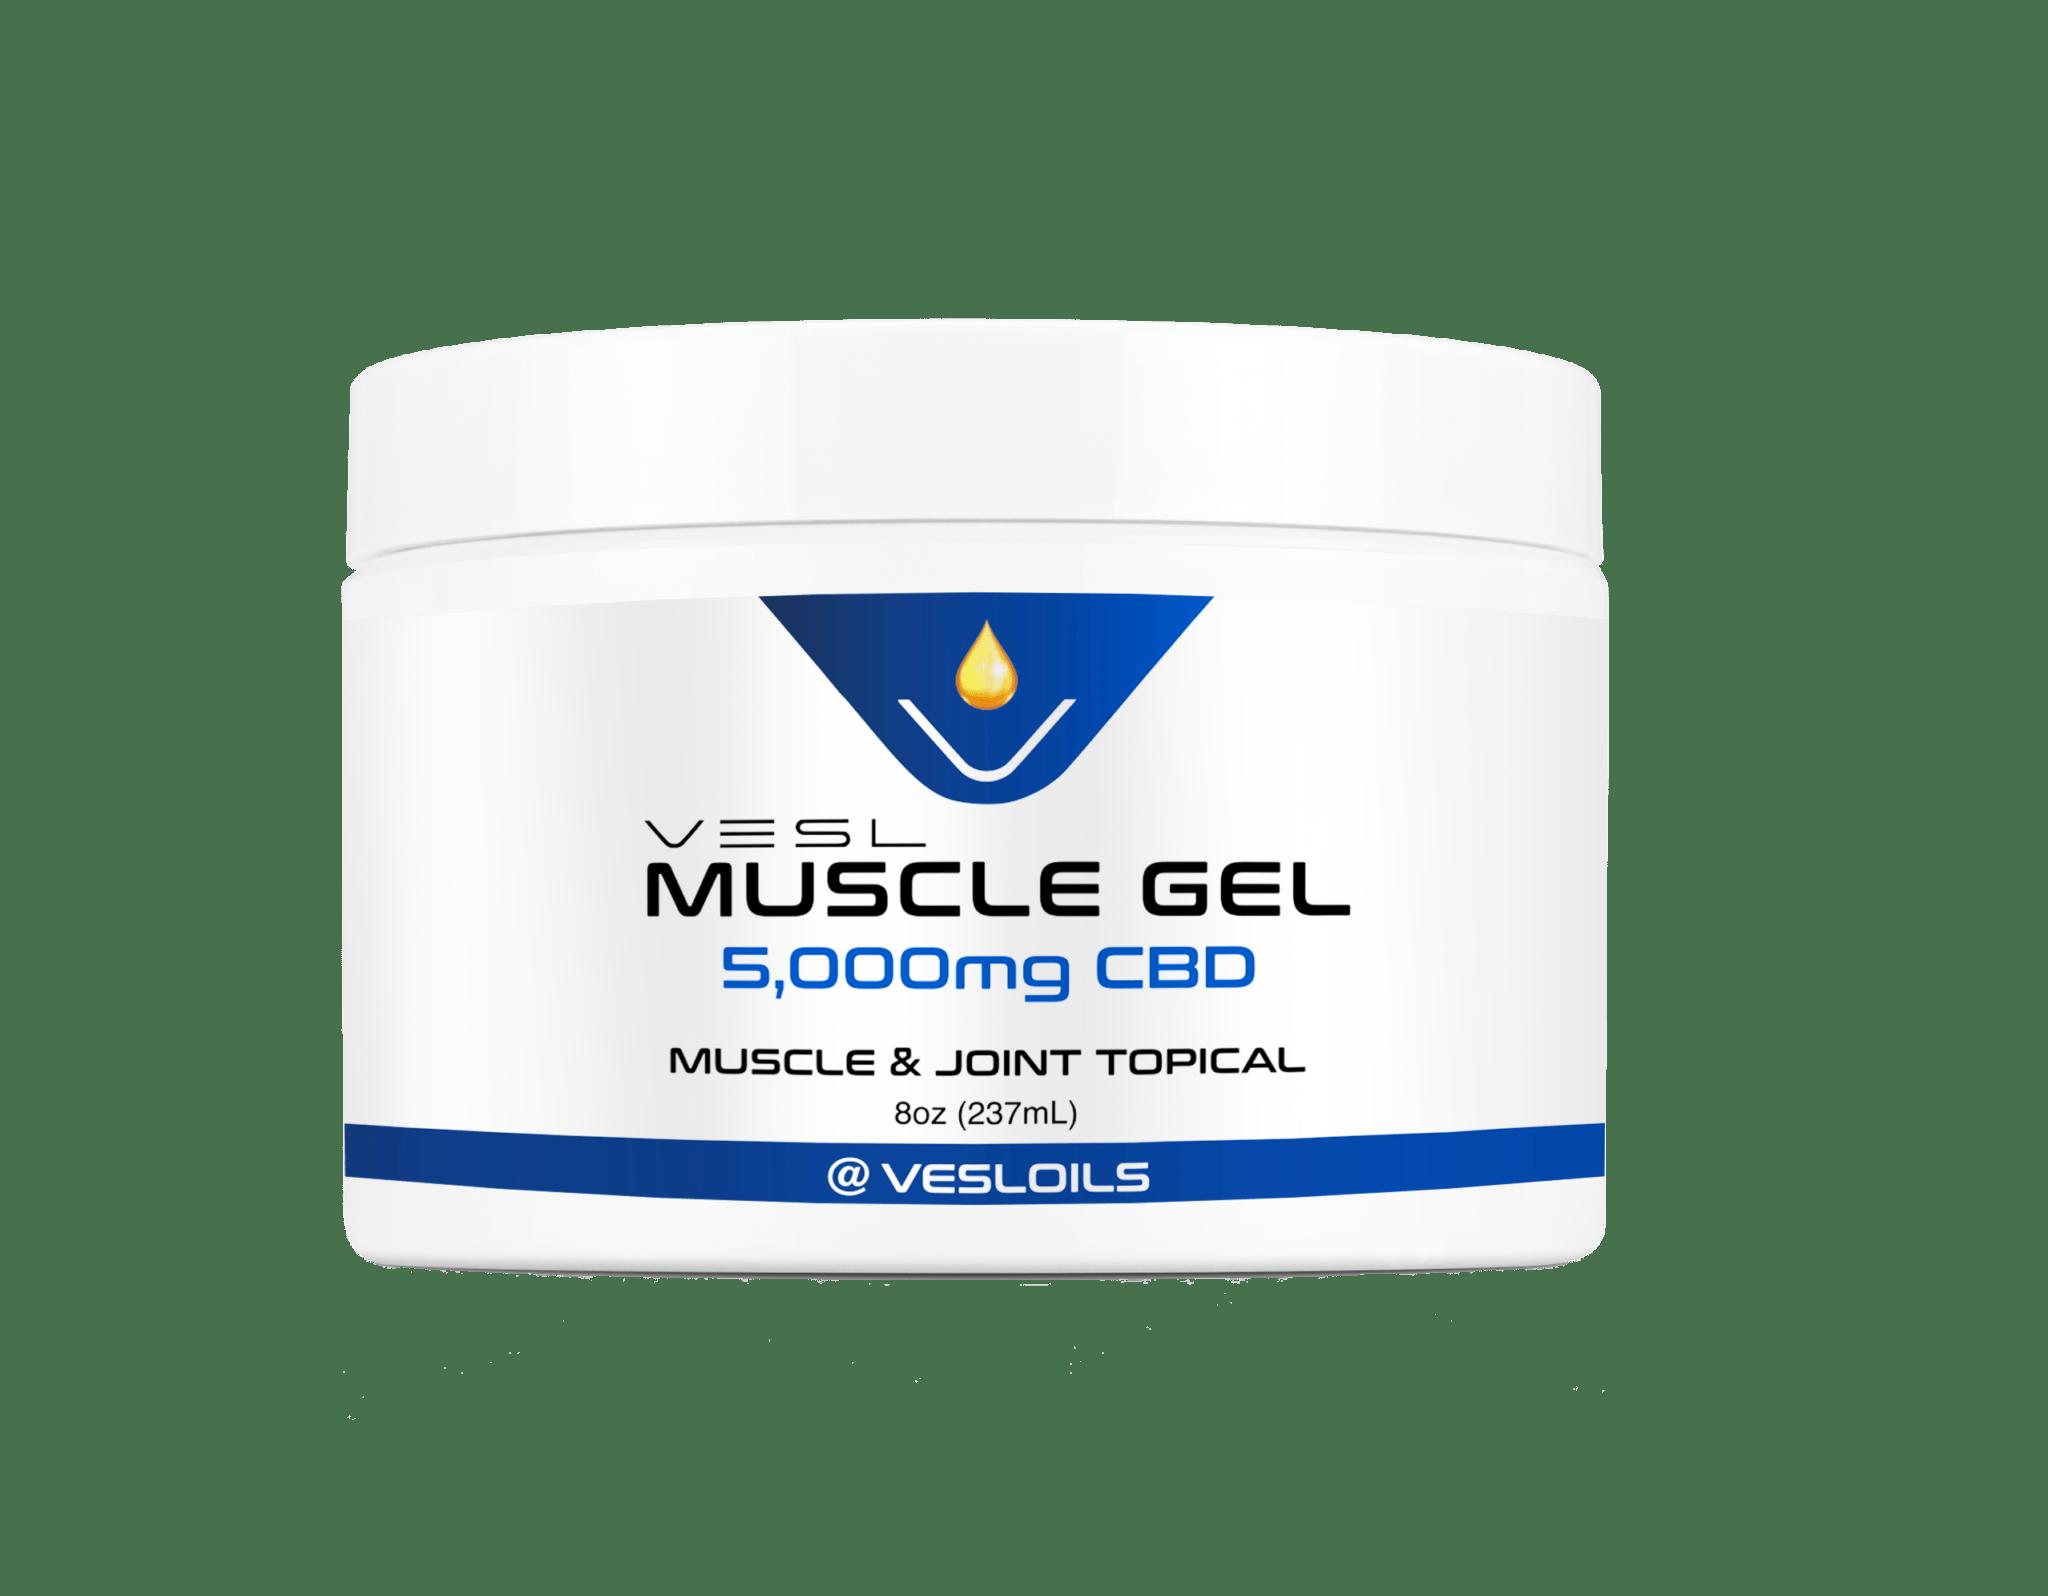 vesl cbd muscle cream 5000mg